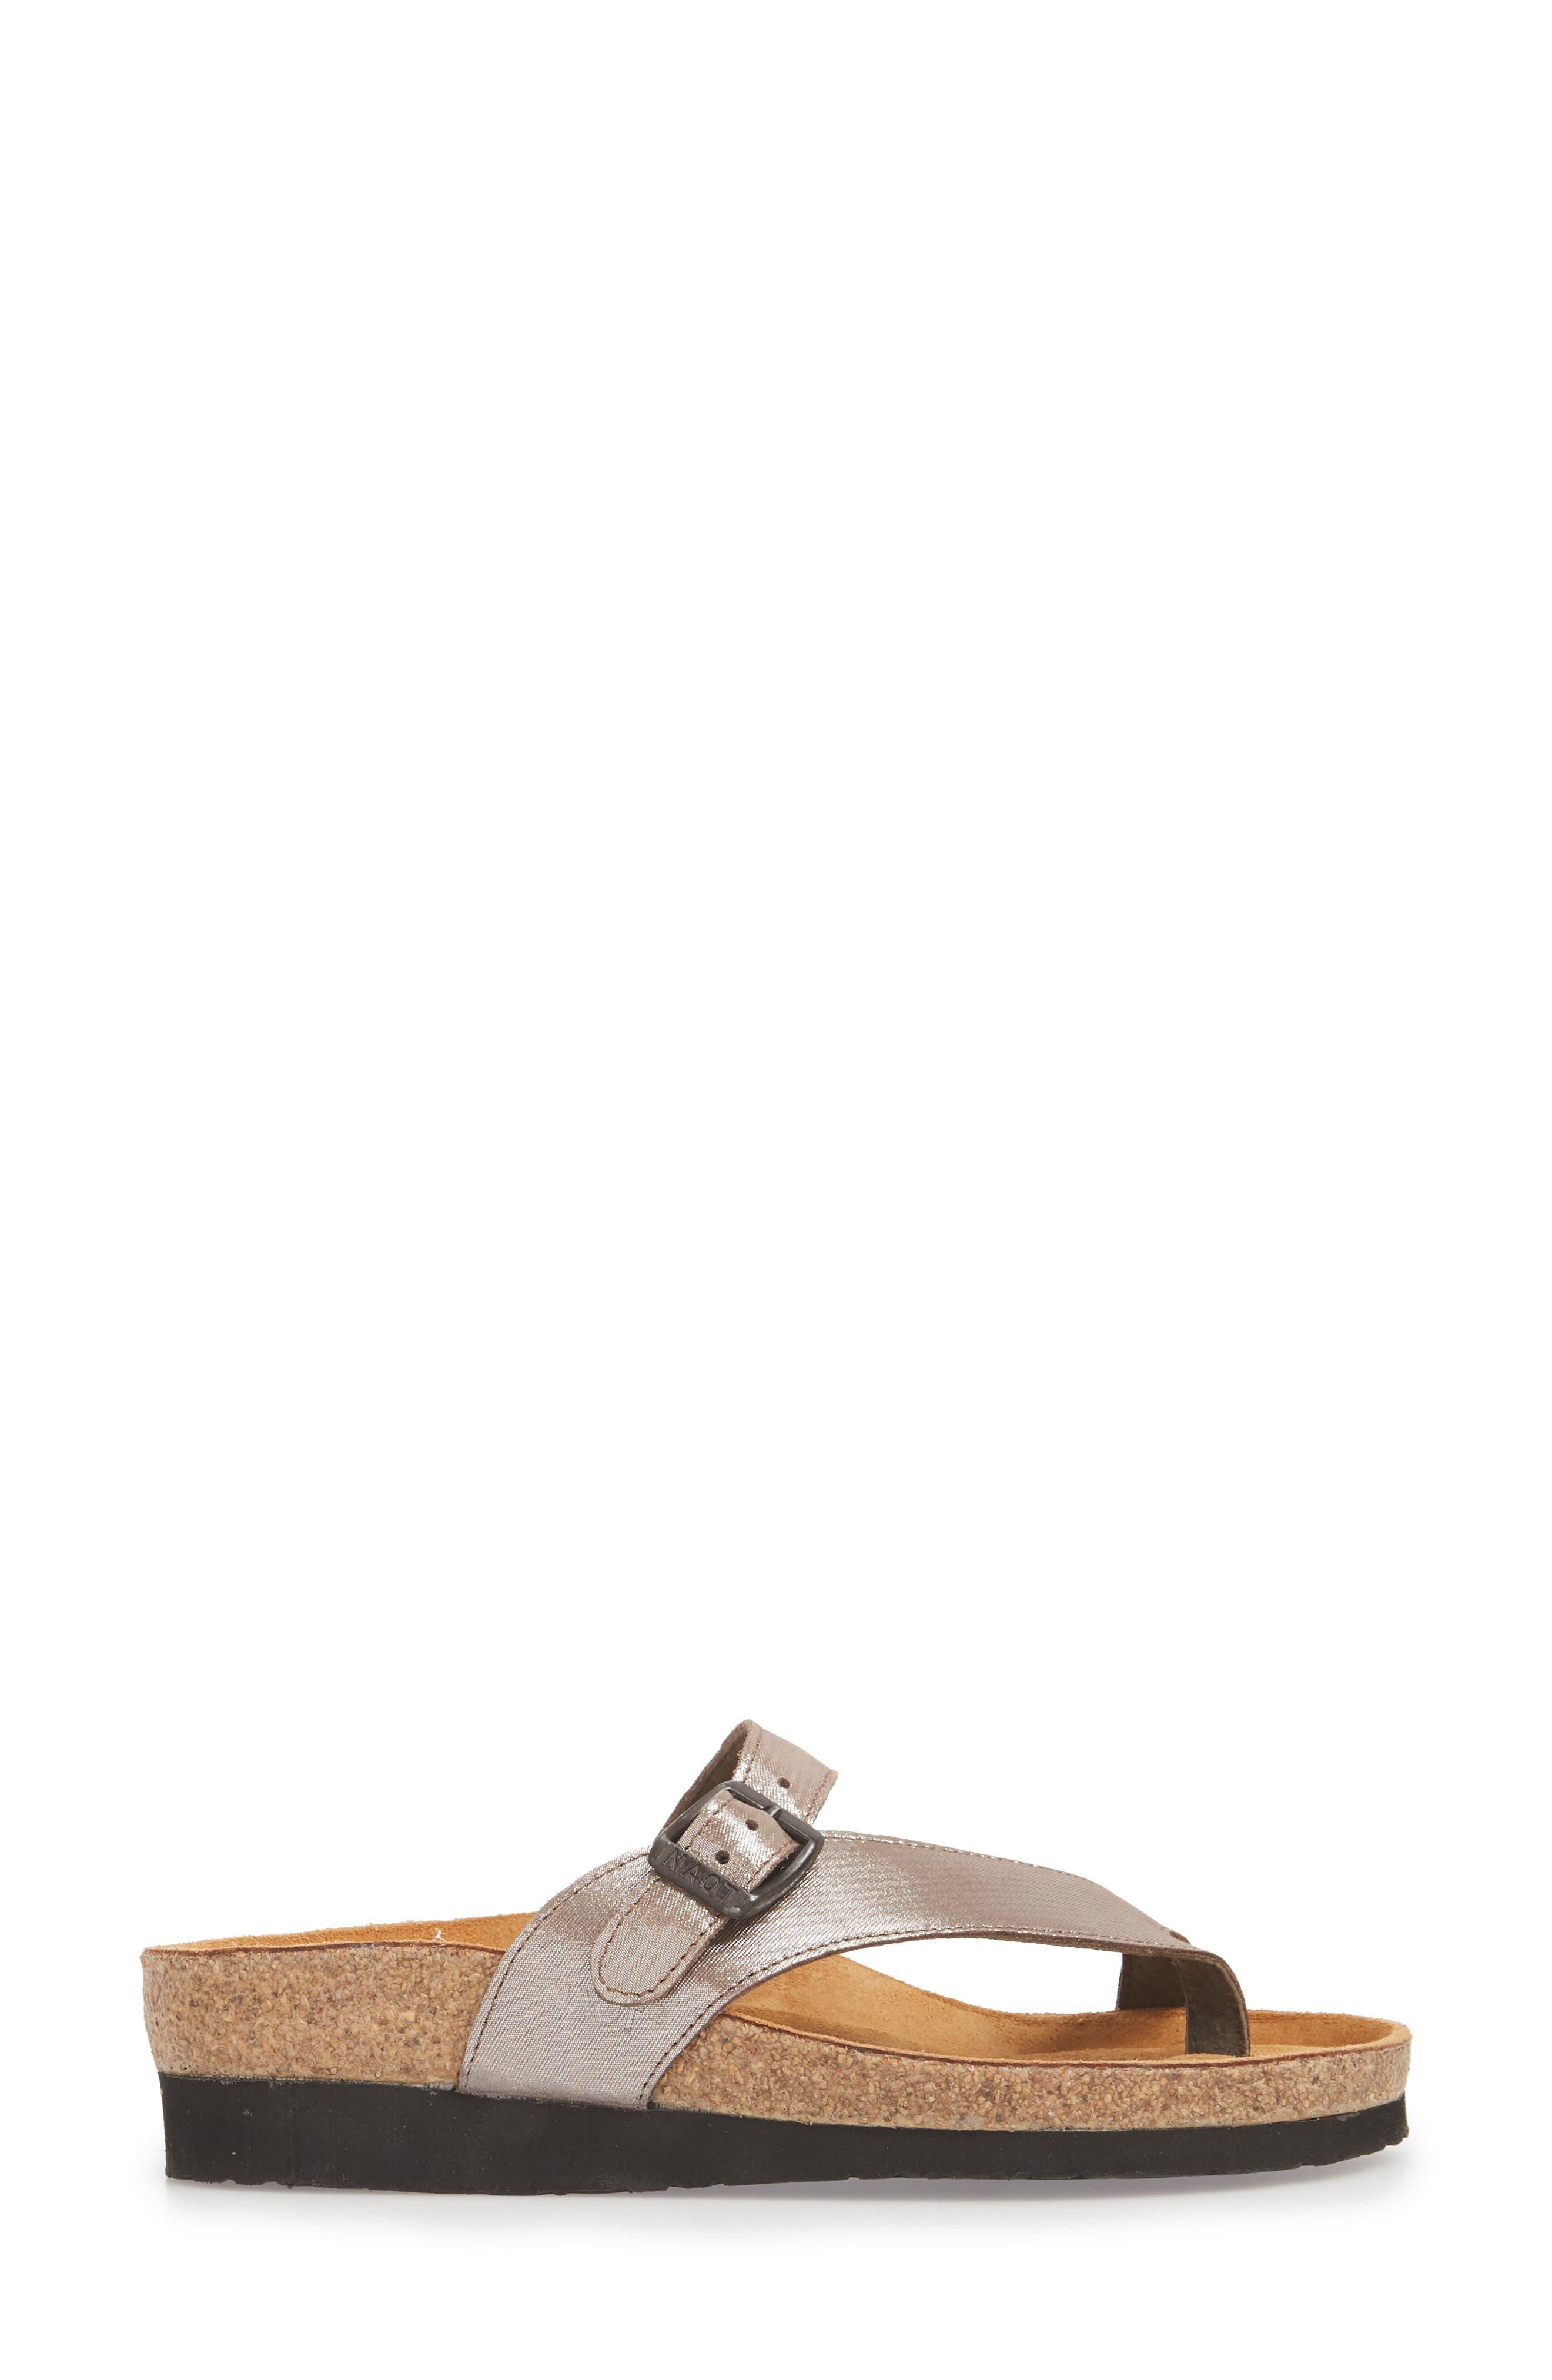 'Tahoe' Sandal,                             Alternate thumbnail 3, color,                             Silver Leather